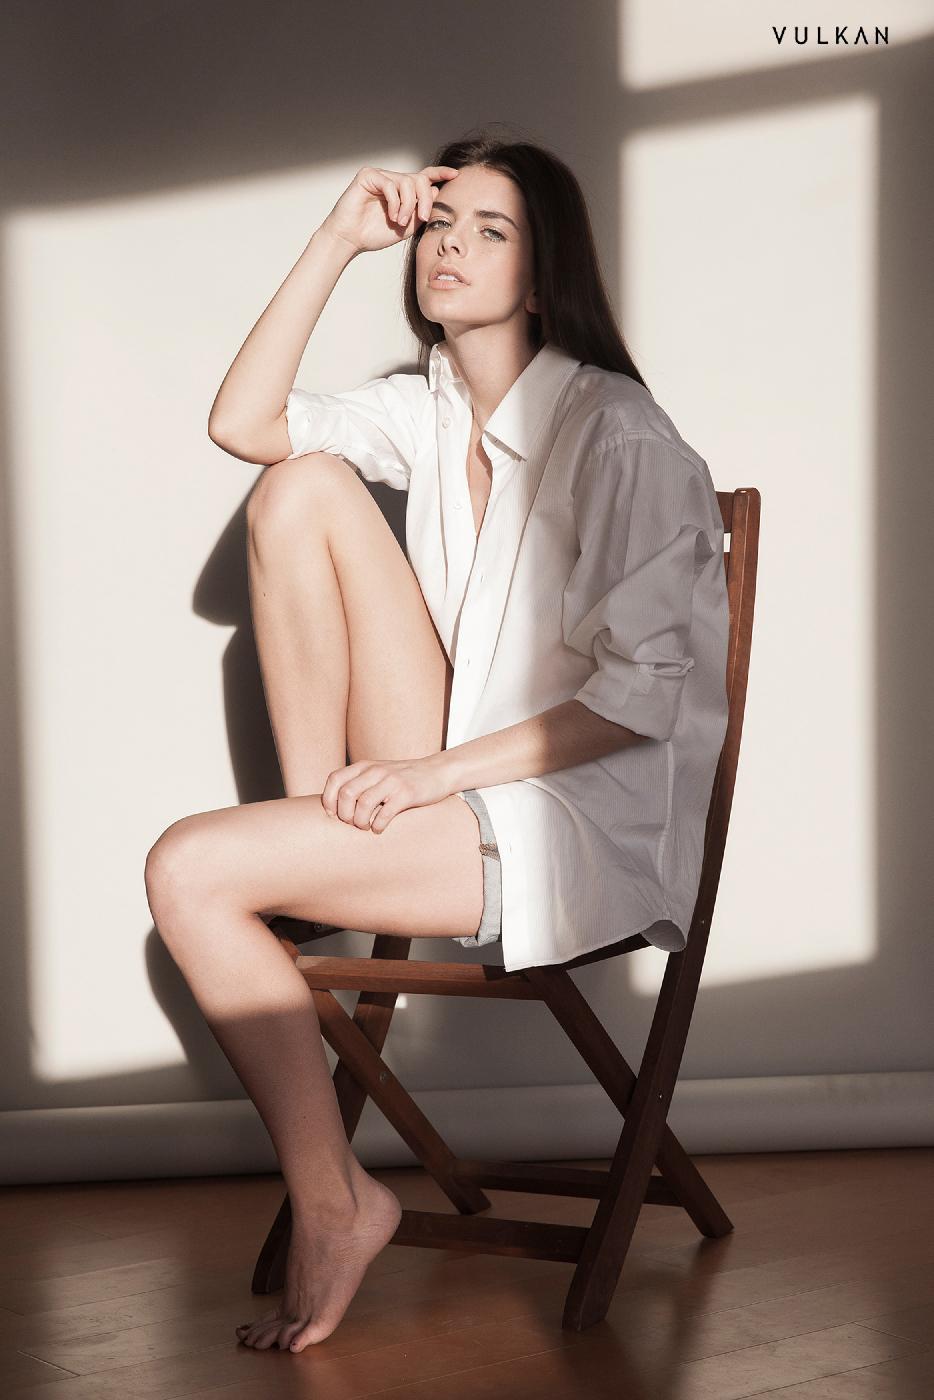 Jasmine Alleva nudes (75 pics) Paparazzi, iCloud, lingerie